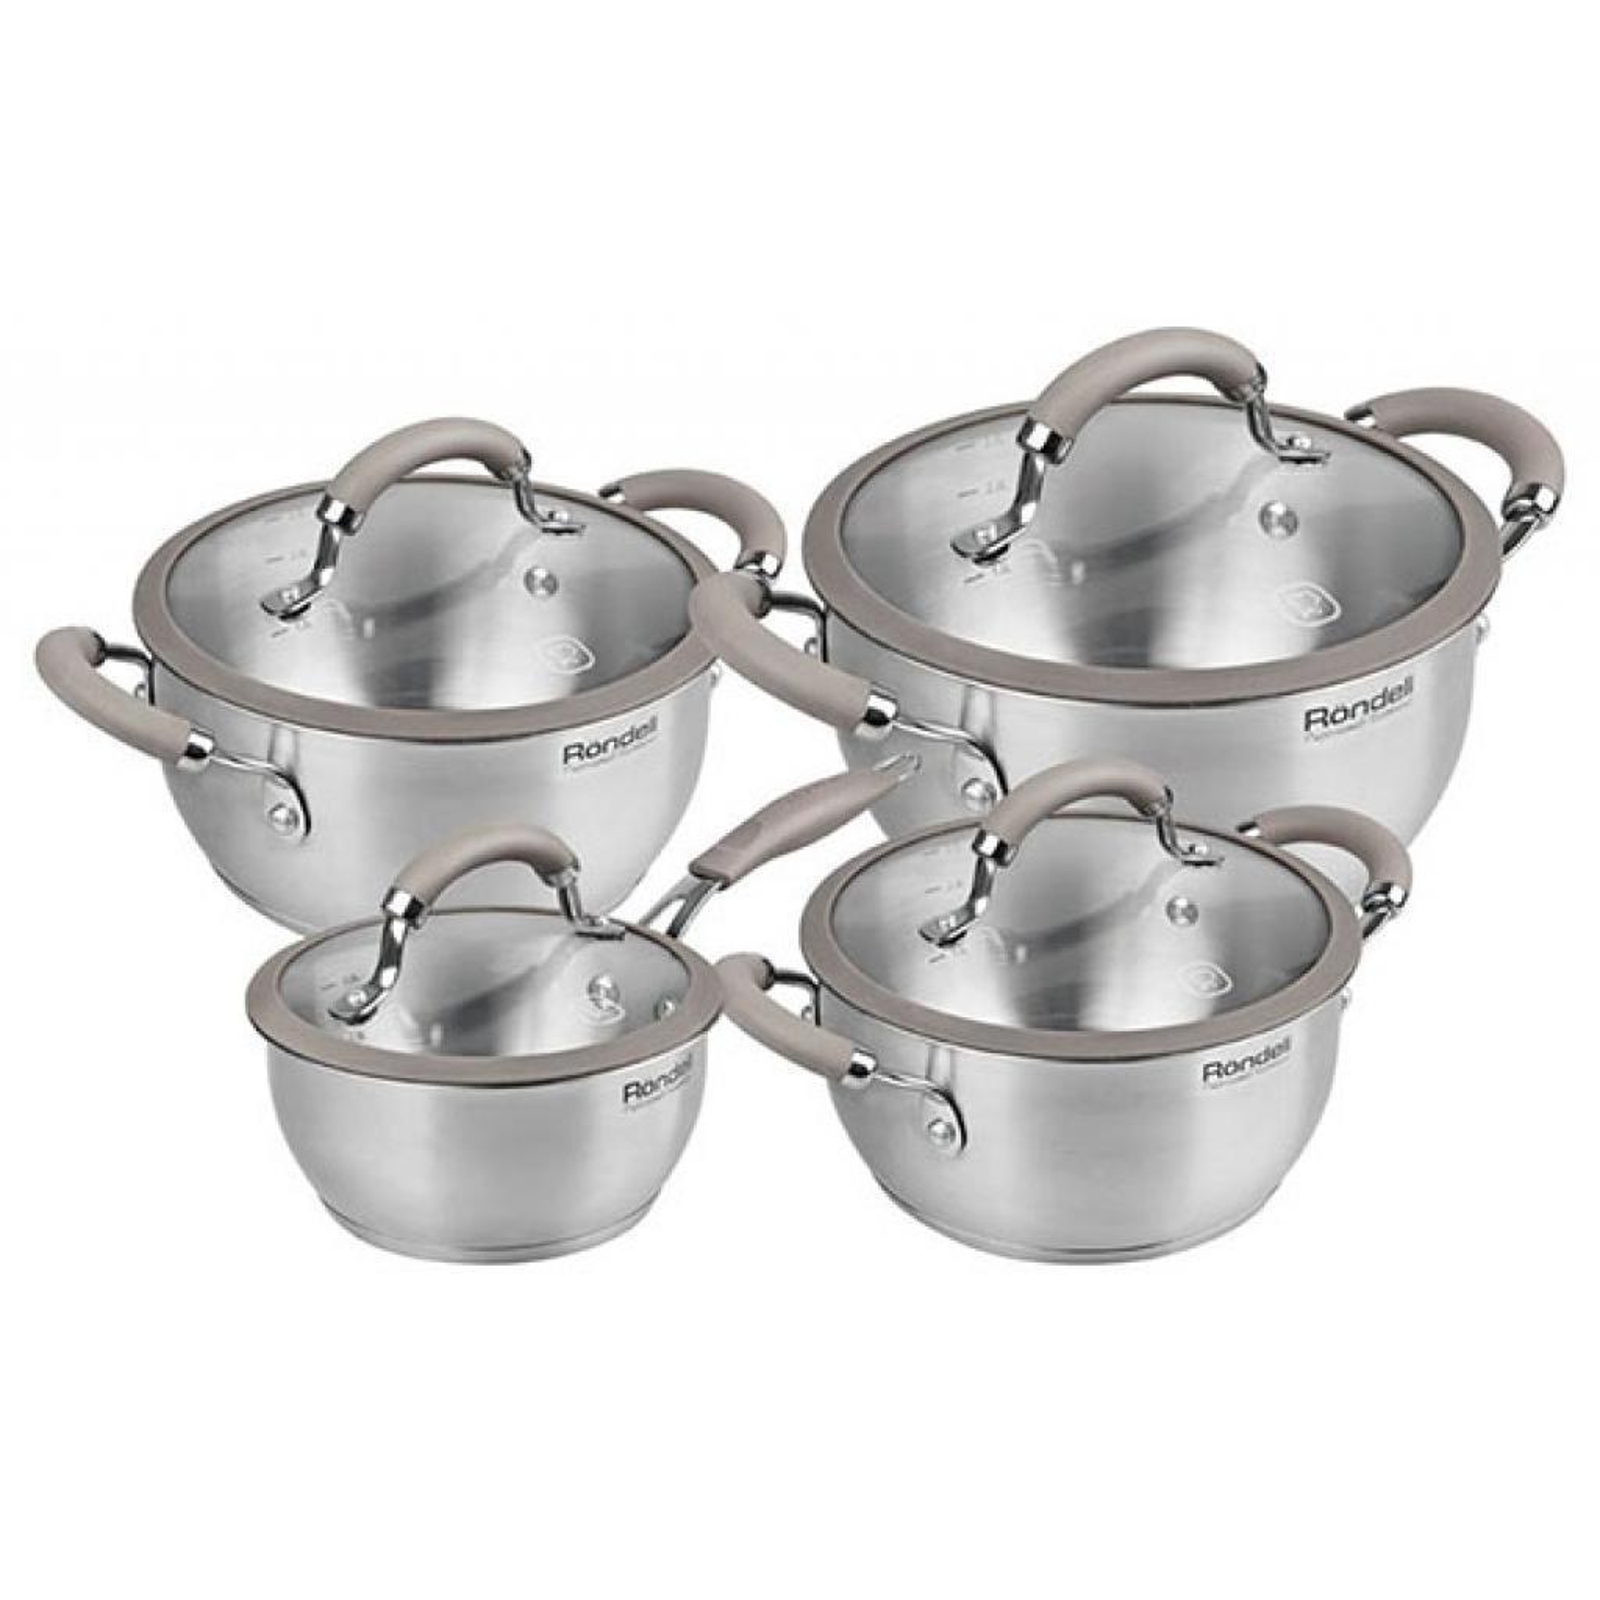 Набор посуды Rondell Balance 8 предметов (RDS-756)